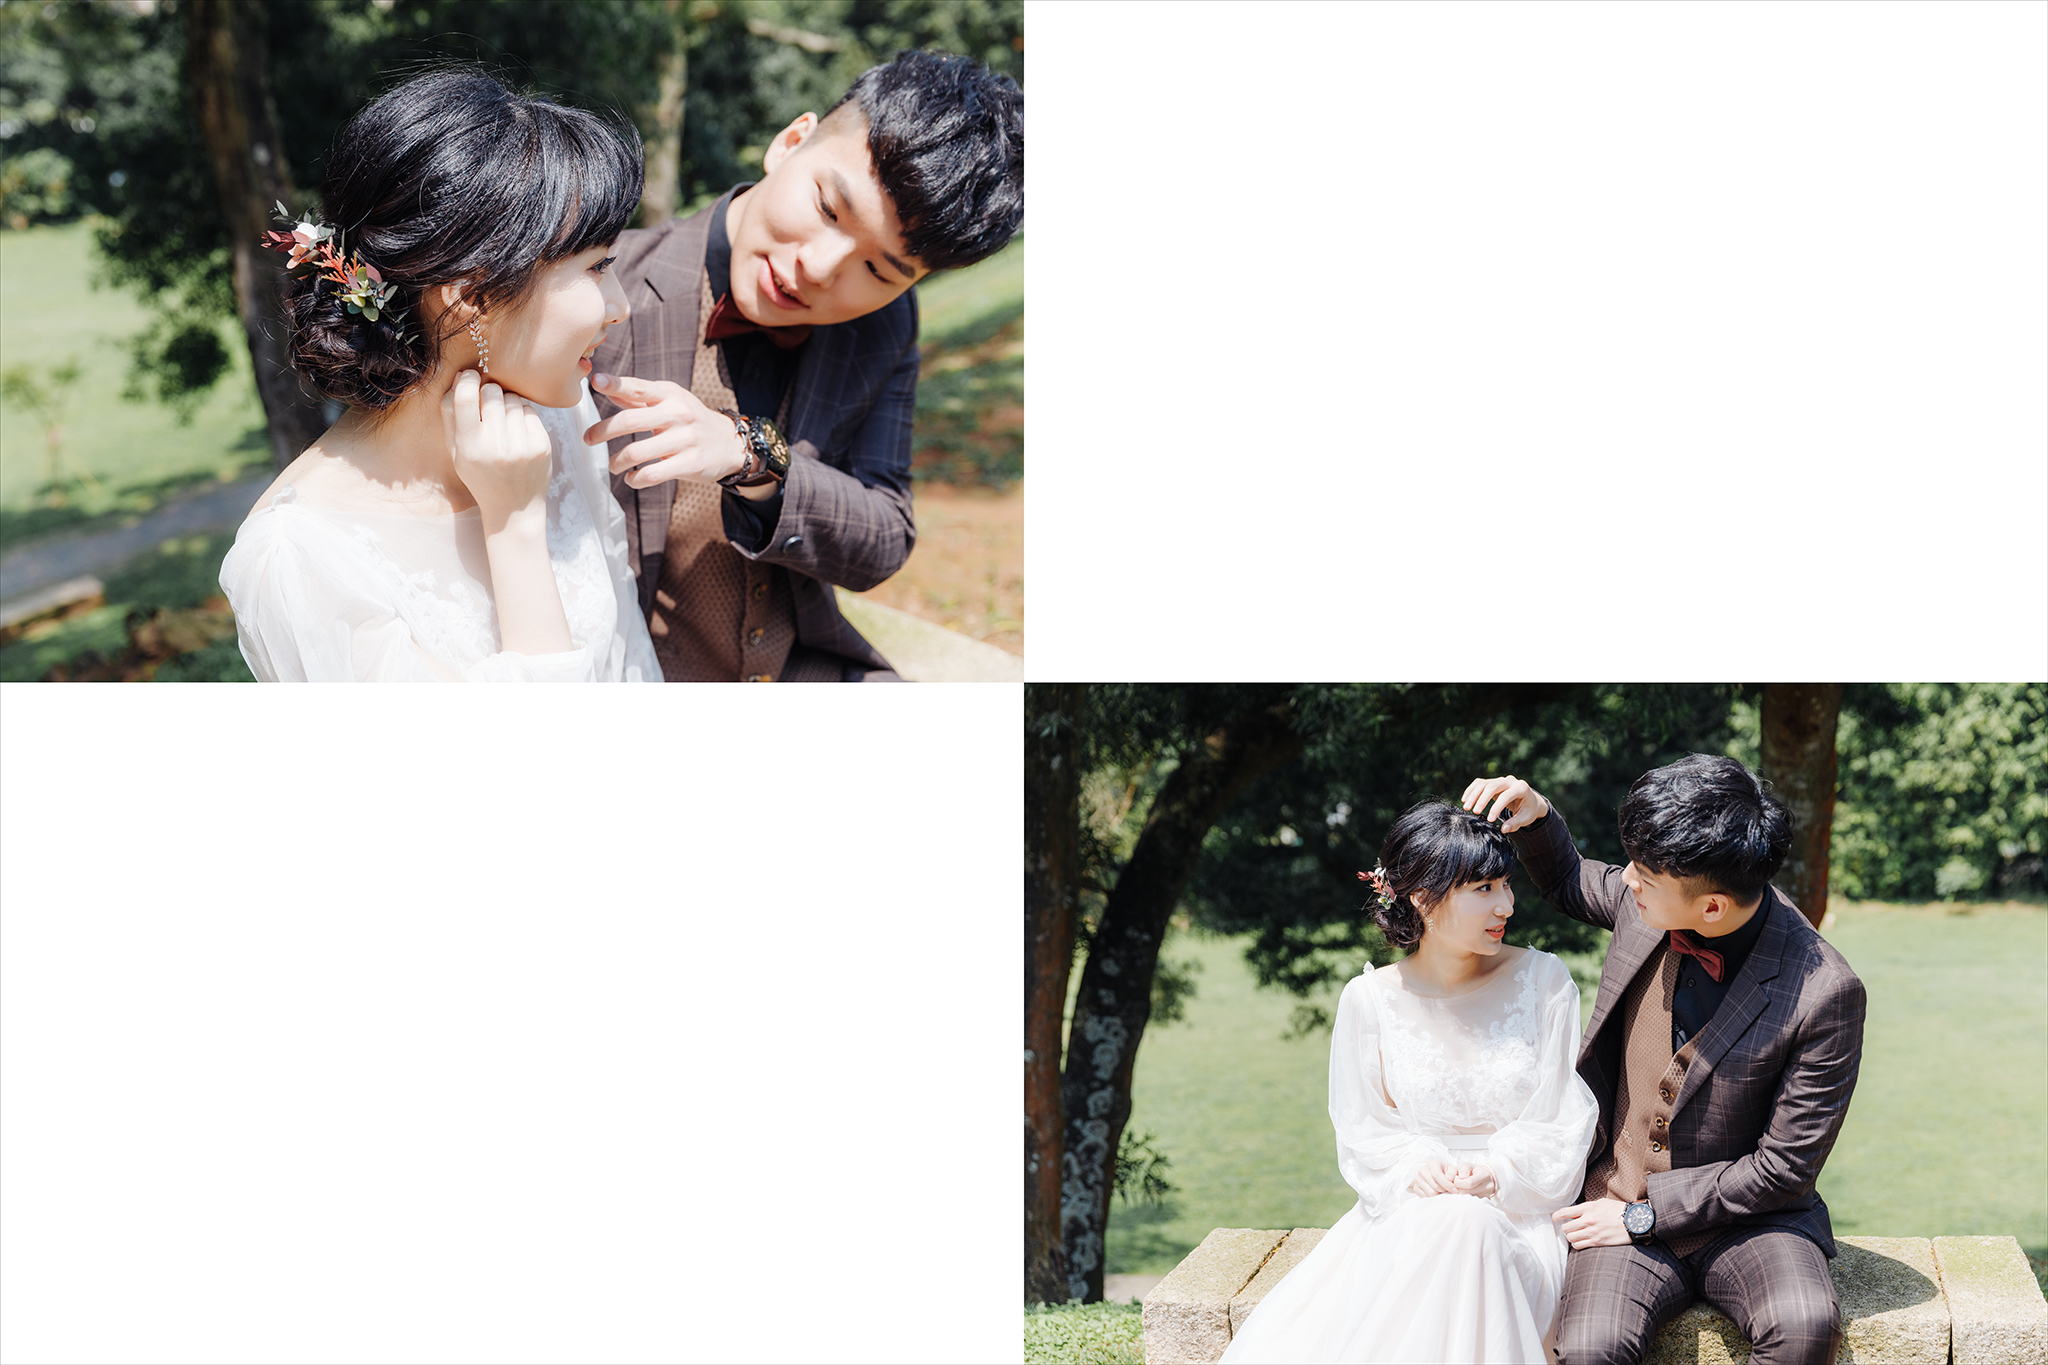 50139937773 5aed9edbcf o - 【自助婚紗】+Vincent&Deer+